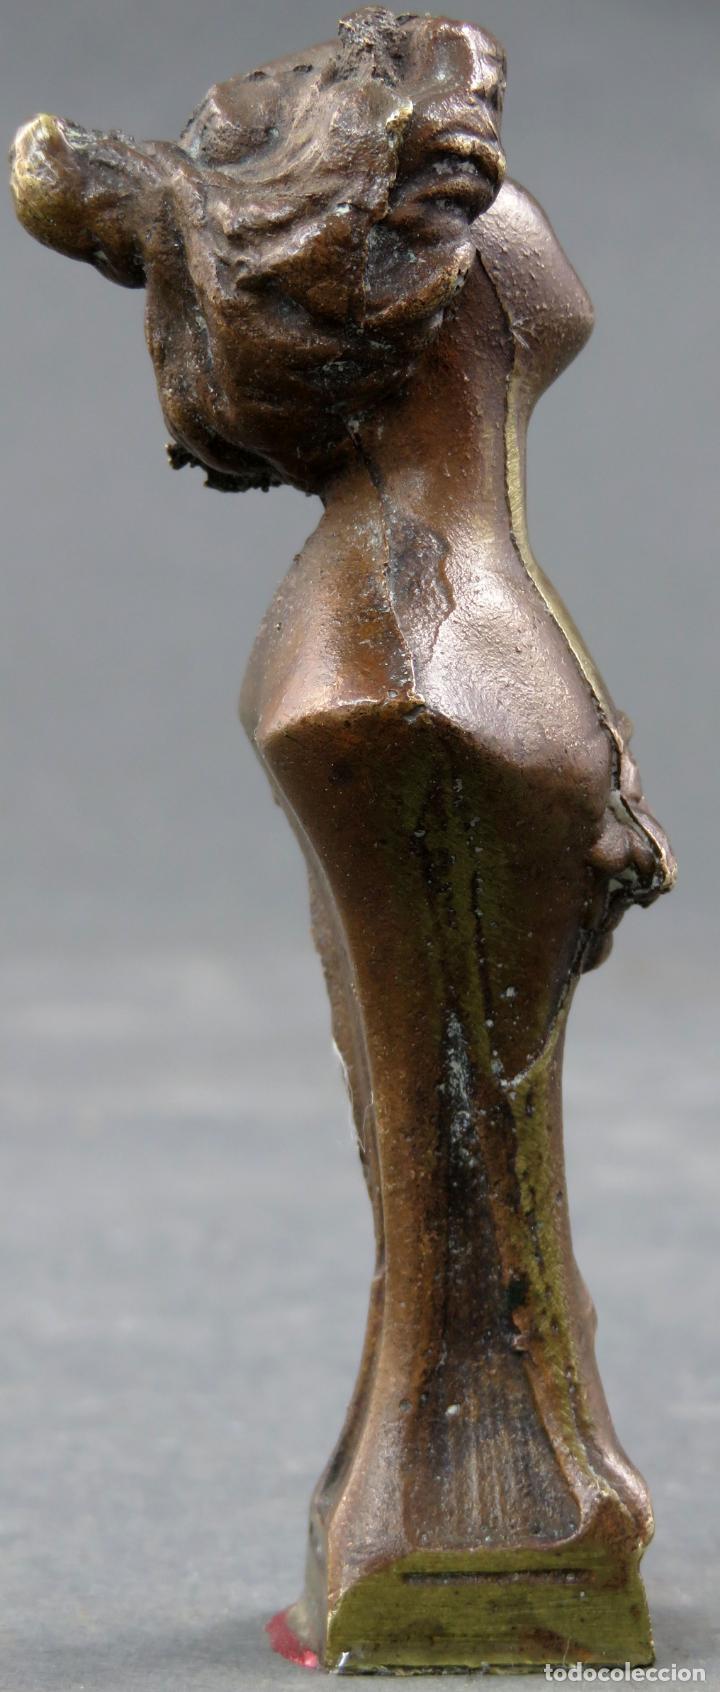 Arte: Sello en bronce Art Nouveau modernista busto femenino hacia 1910 - Foto 4 - 154967190